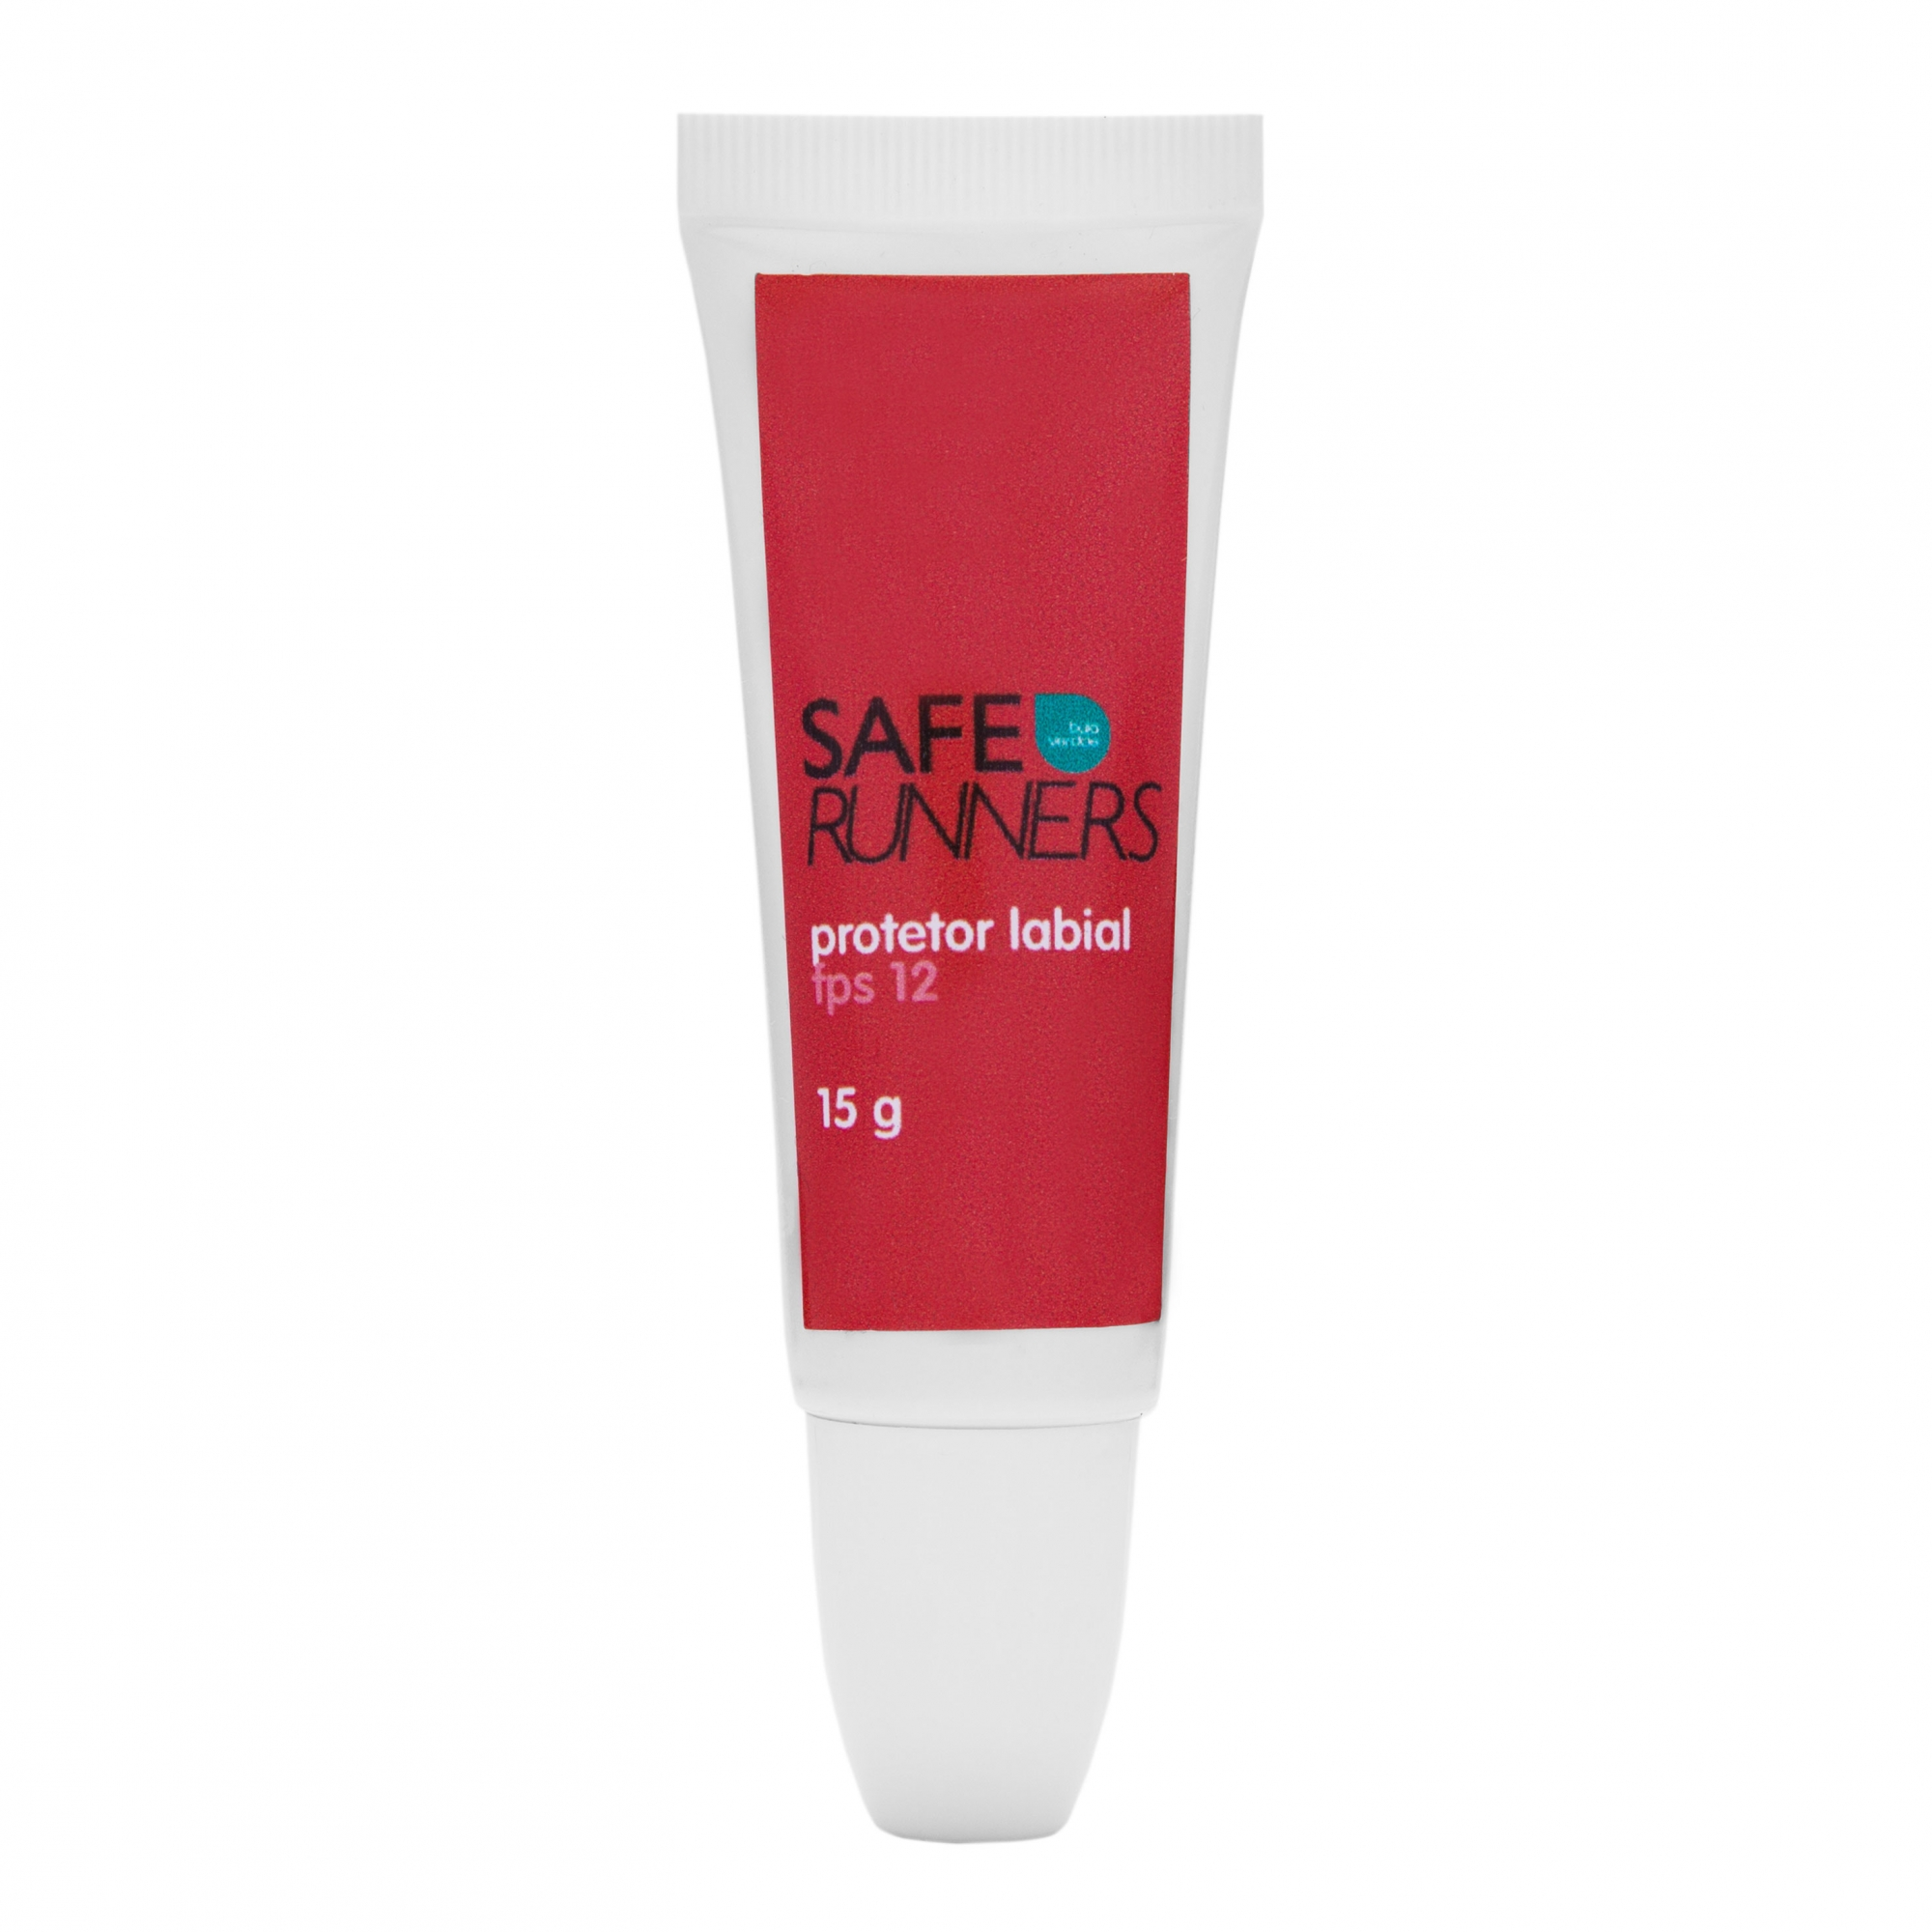 Protetor Labial FPS 12 Safe Runners 15g D-pantenol e Vitamina E